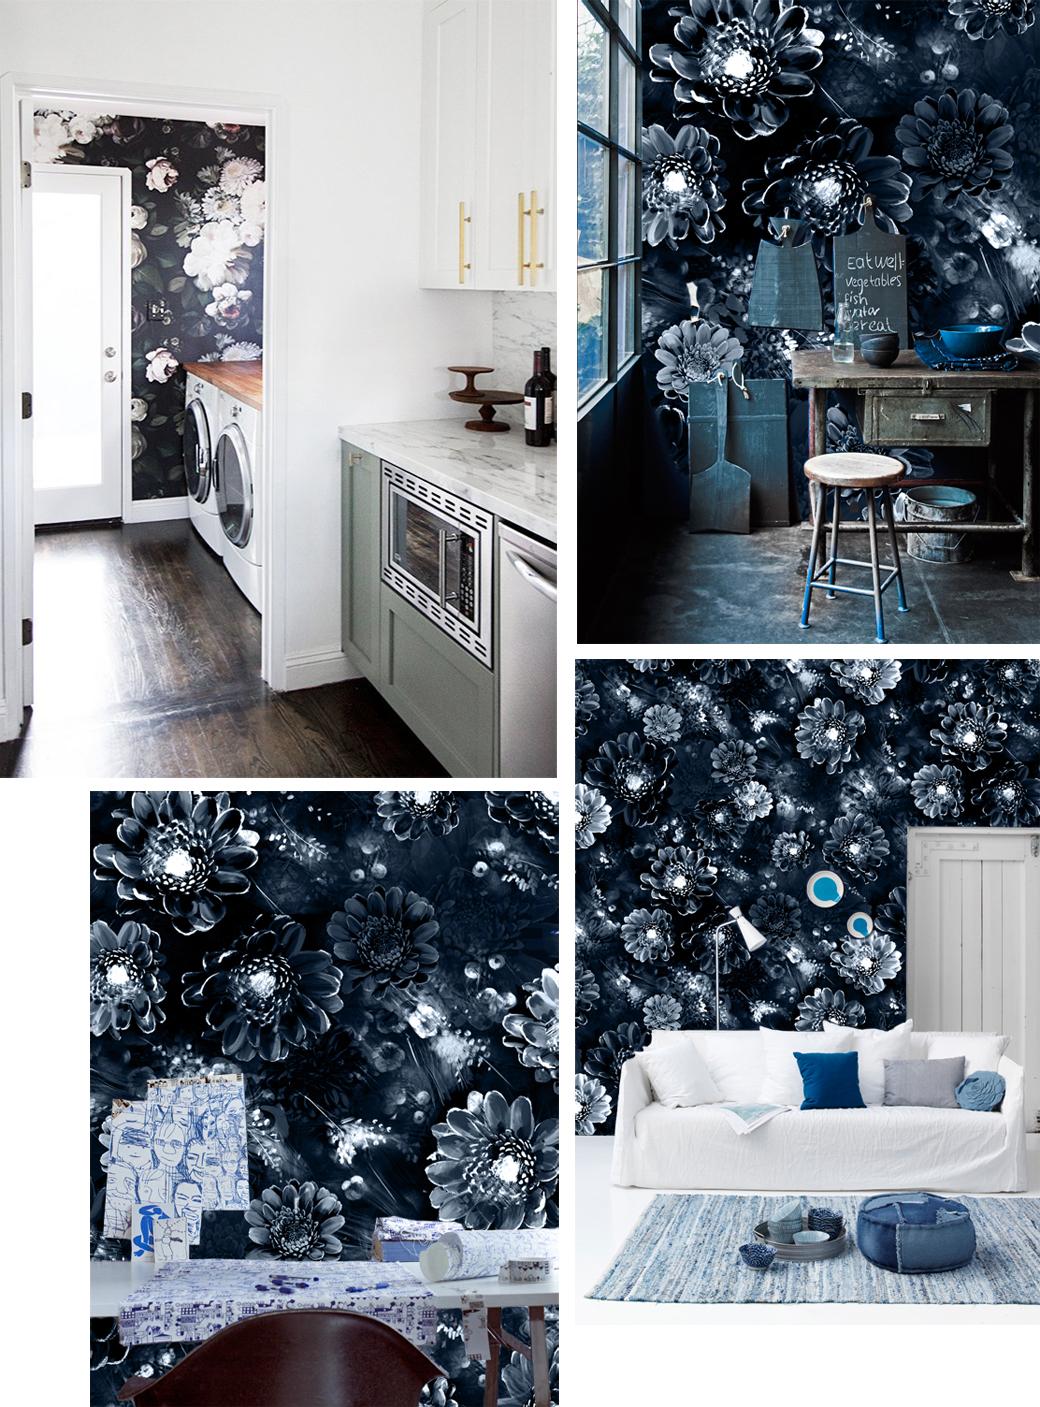 Black floral print wallpaper dark floral wallpaper by ellie cashman - All Others Ellie Cashman Rps1833_nikki_sitroom02_01_lowres